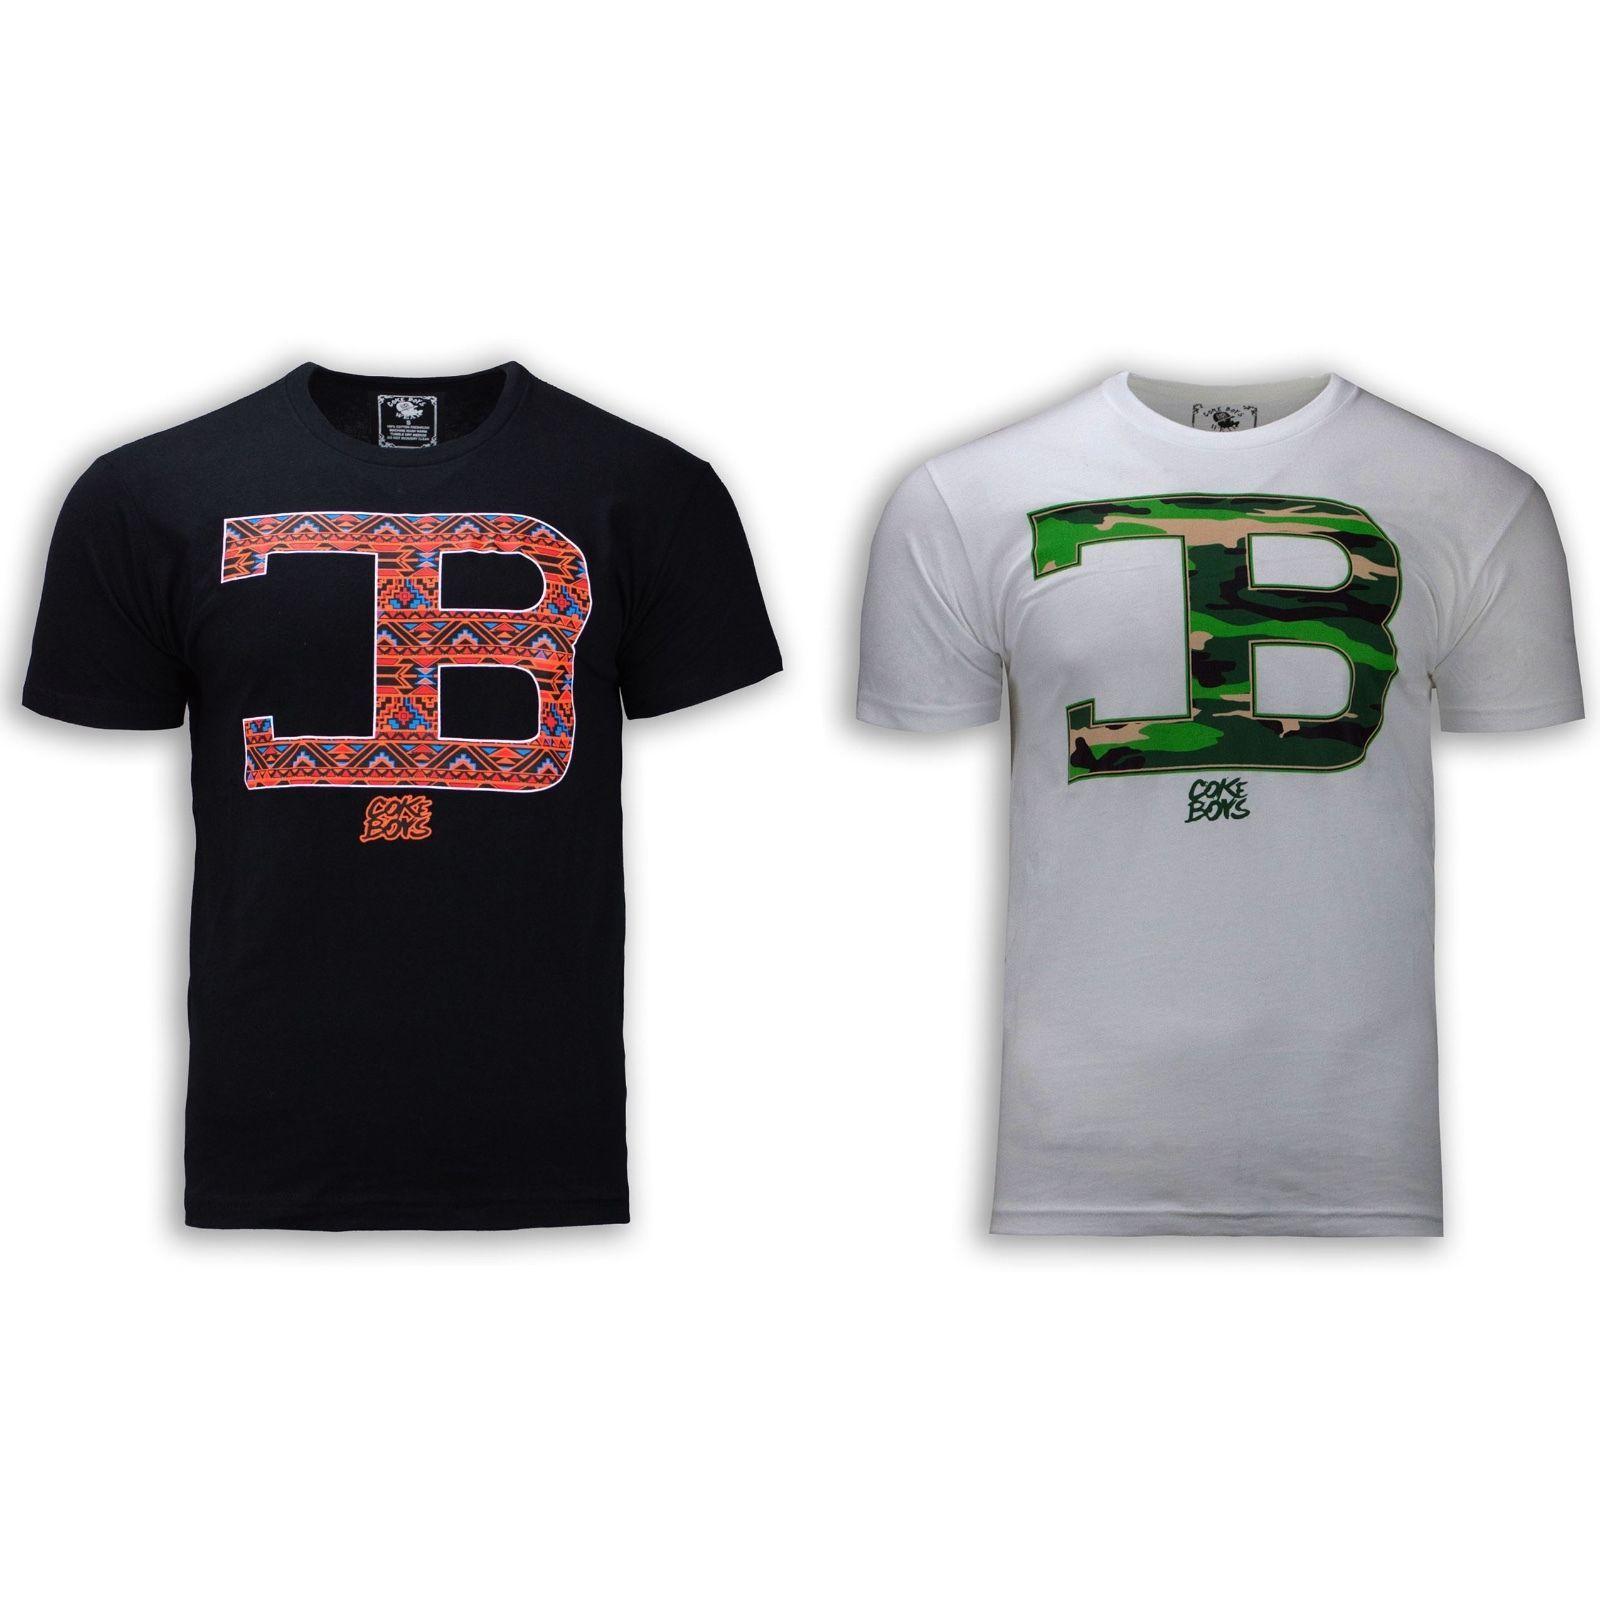 228aaf67 NEW Men Coke Boys T Shirt Size Small Hip Hop Short Sleeve Camo CB ShirtMen Women  Unisex Fashion Tshirt Online Buy T Shirts Tna Shirts From ...